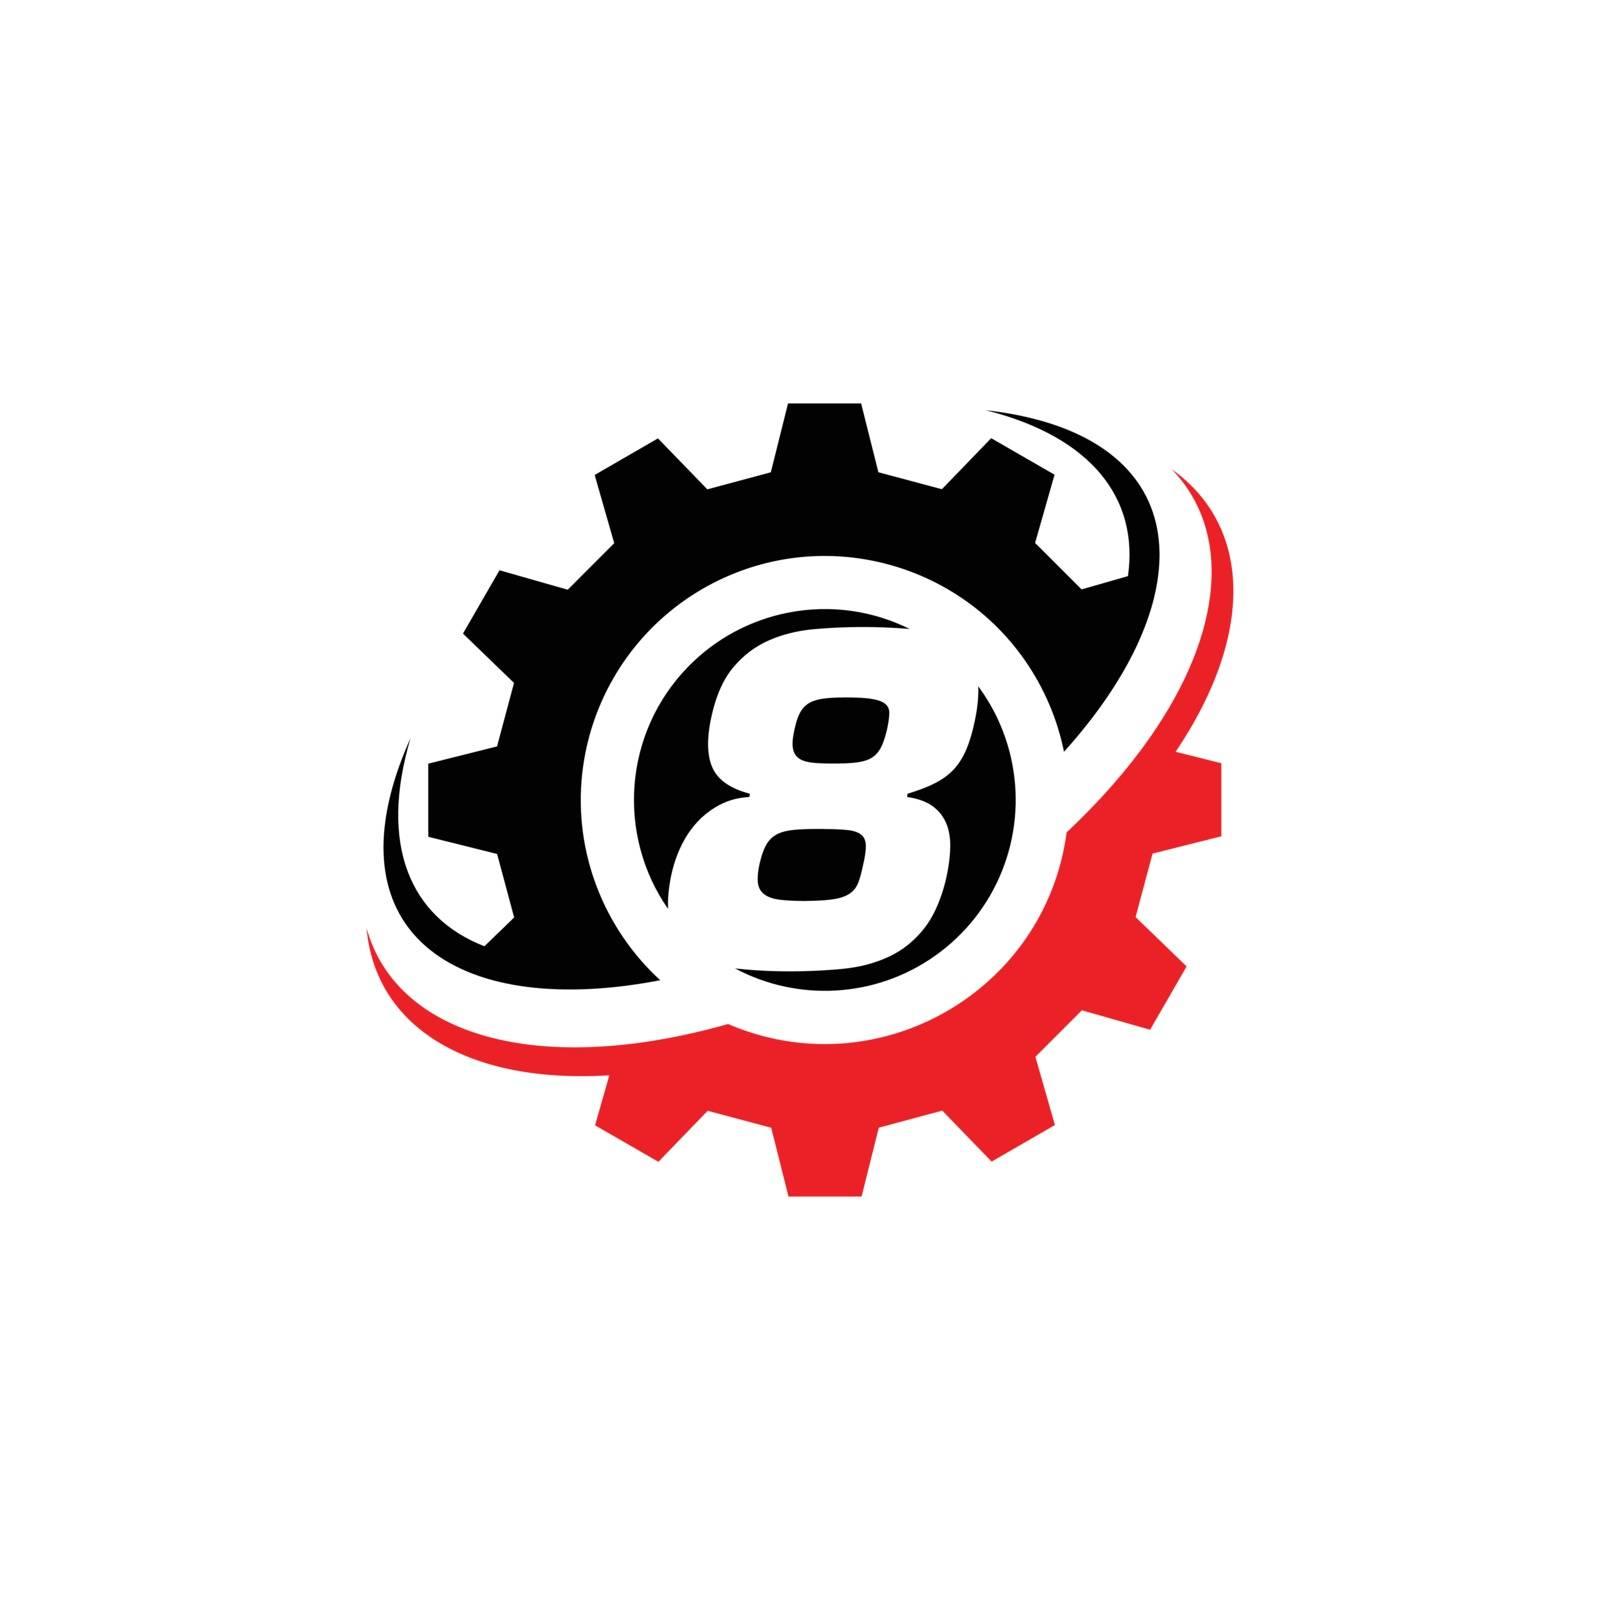 Number 8 Gear Logo Design Template